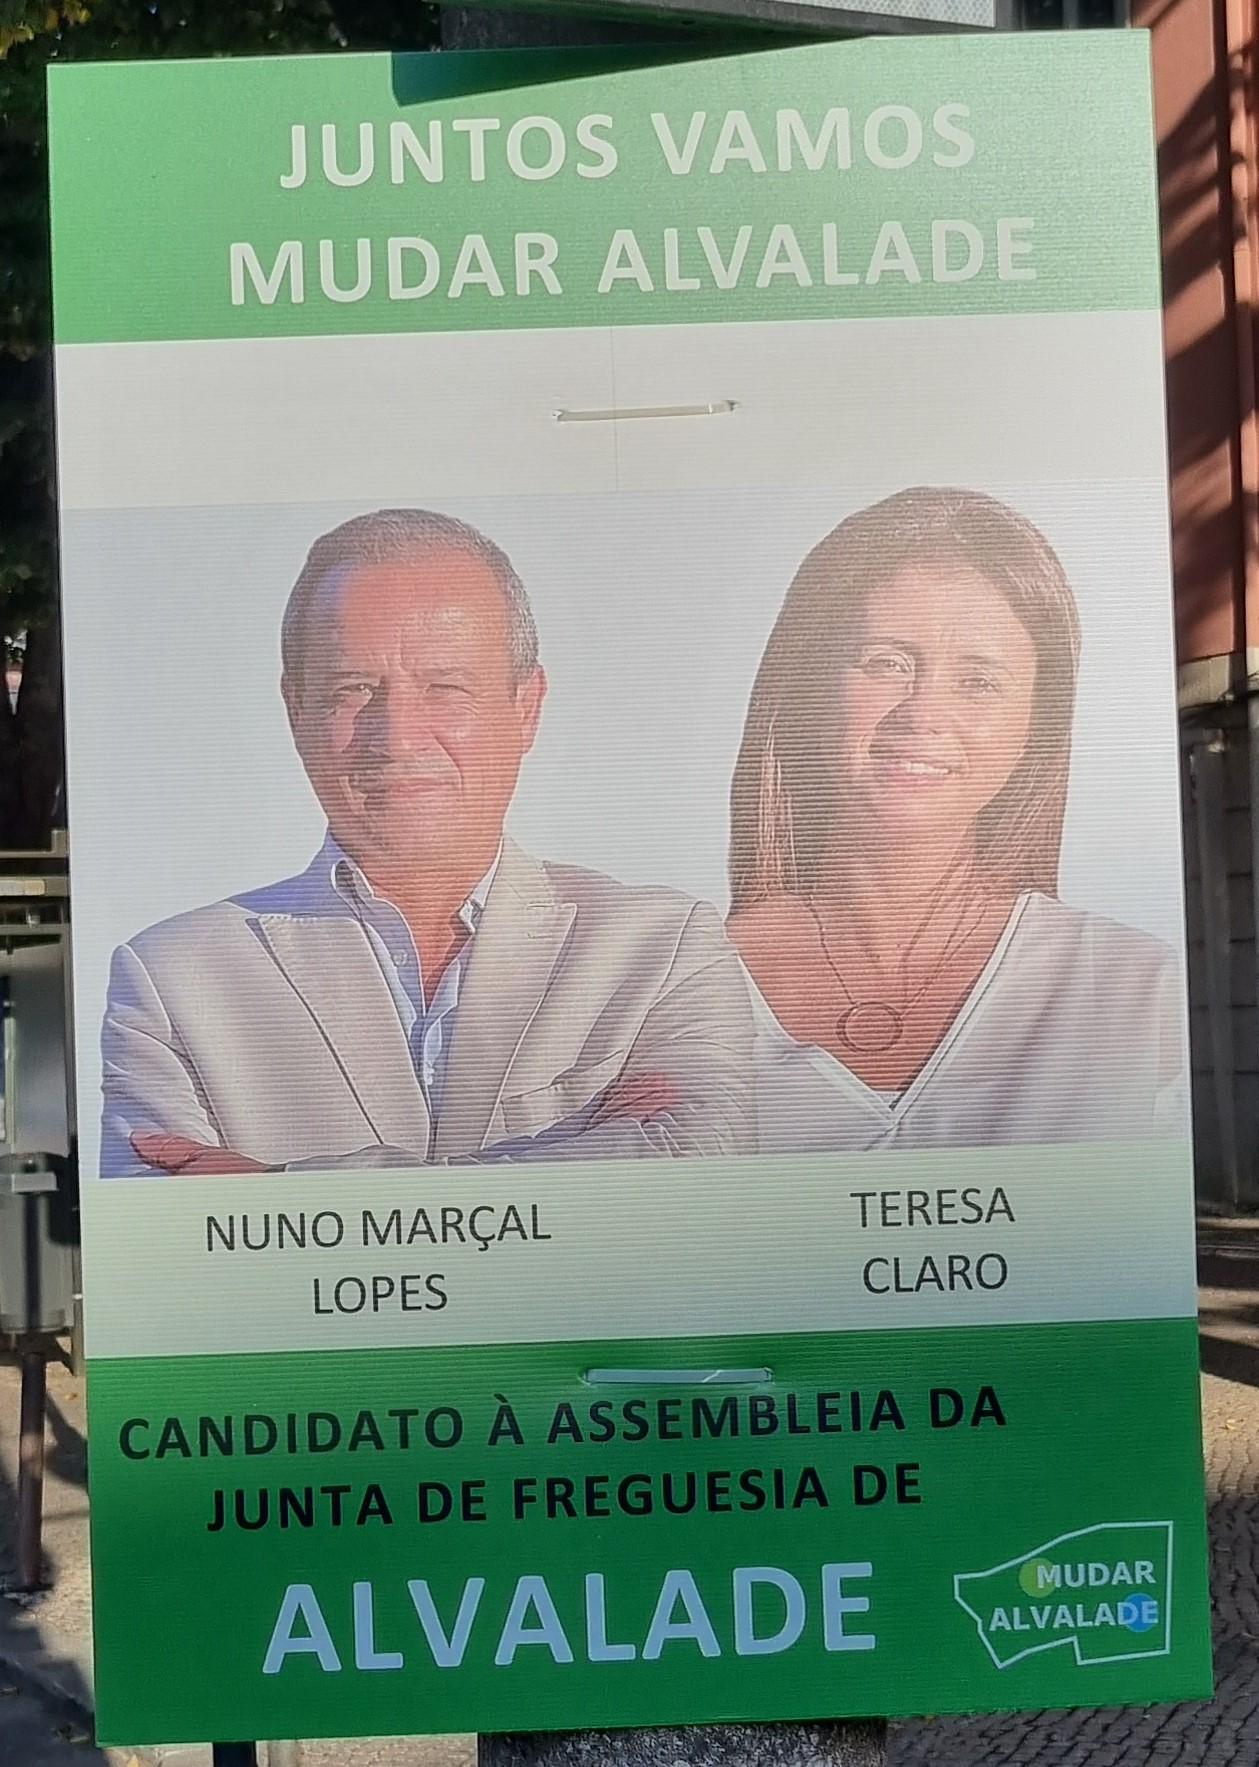 indi_Mudar Alvalade_2021_Lisboa_Alvalade_02